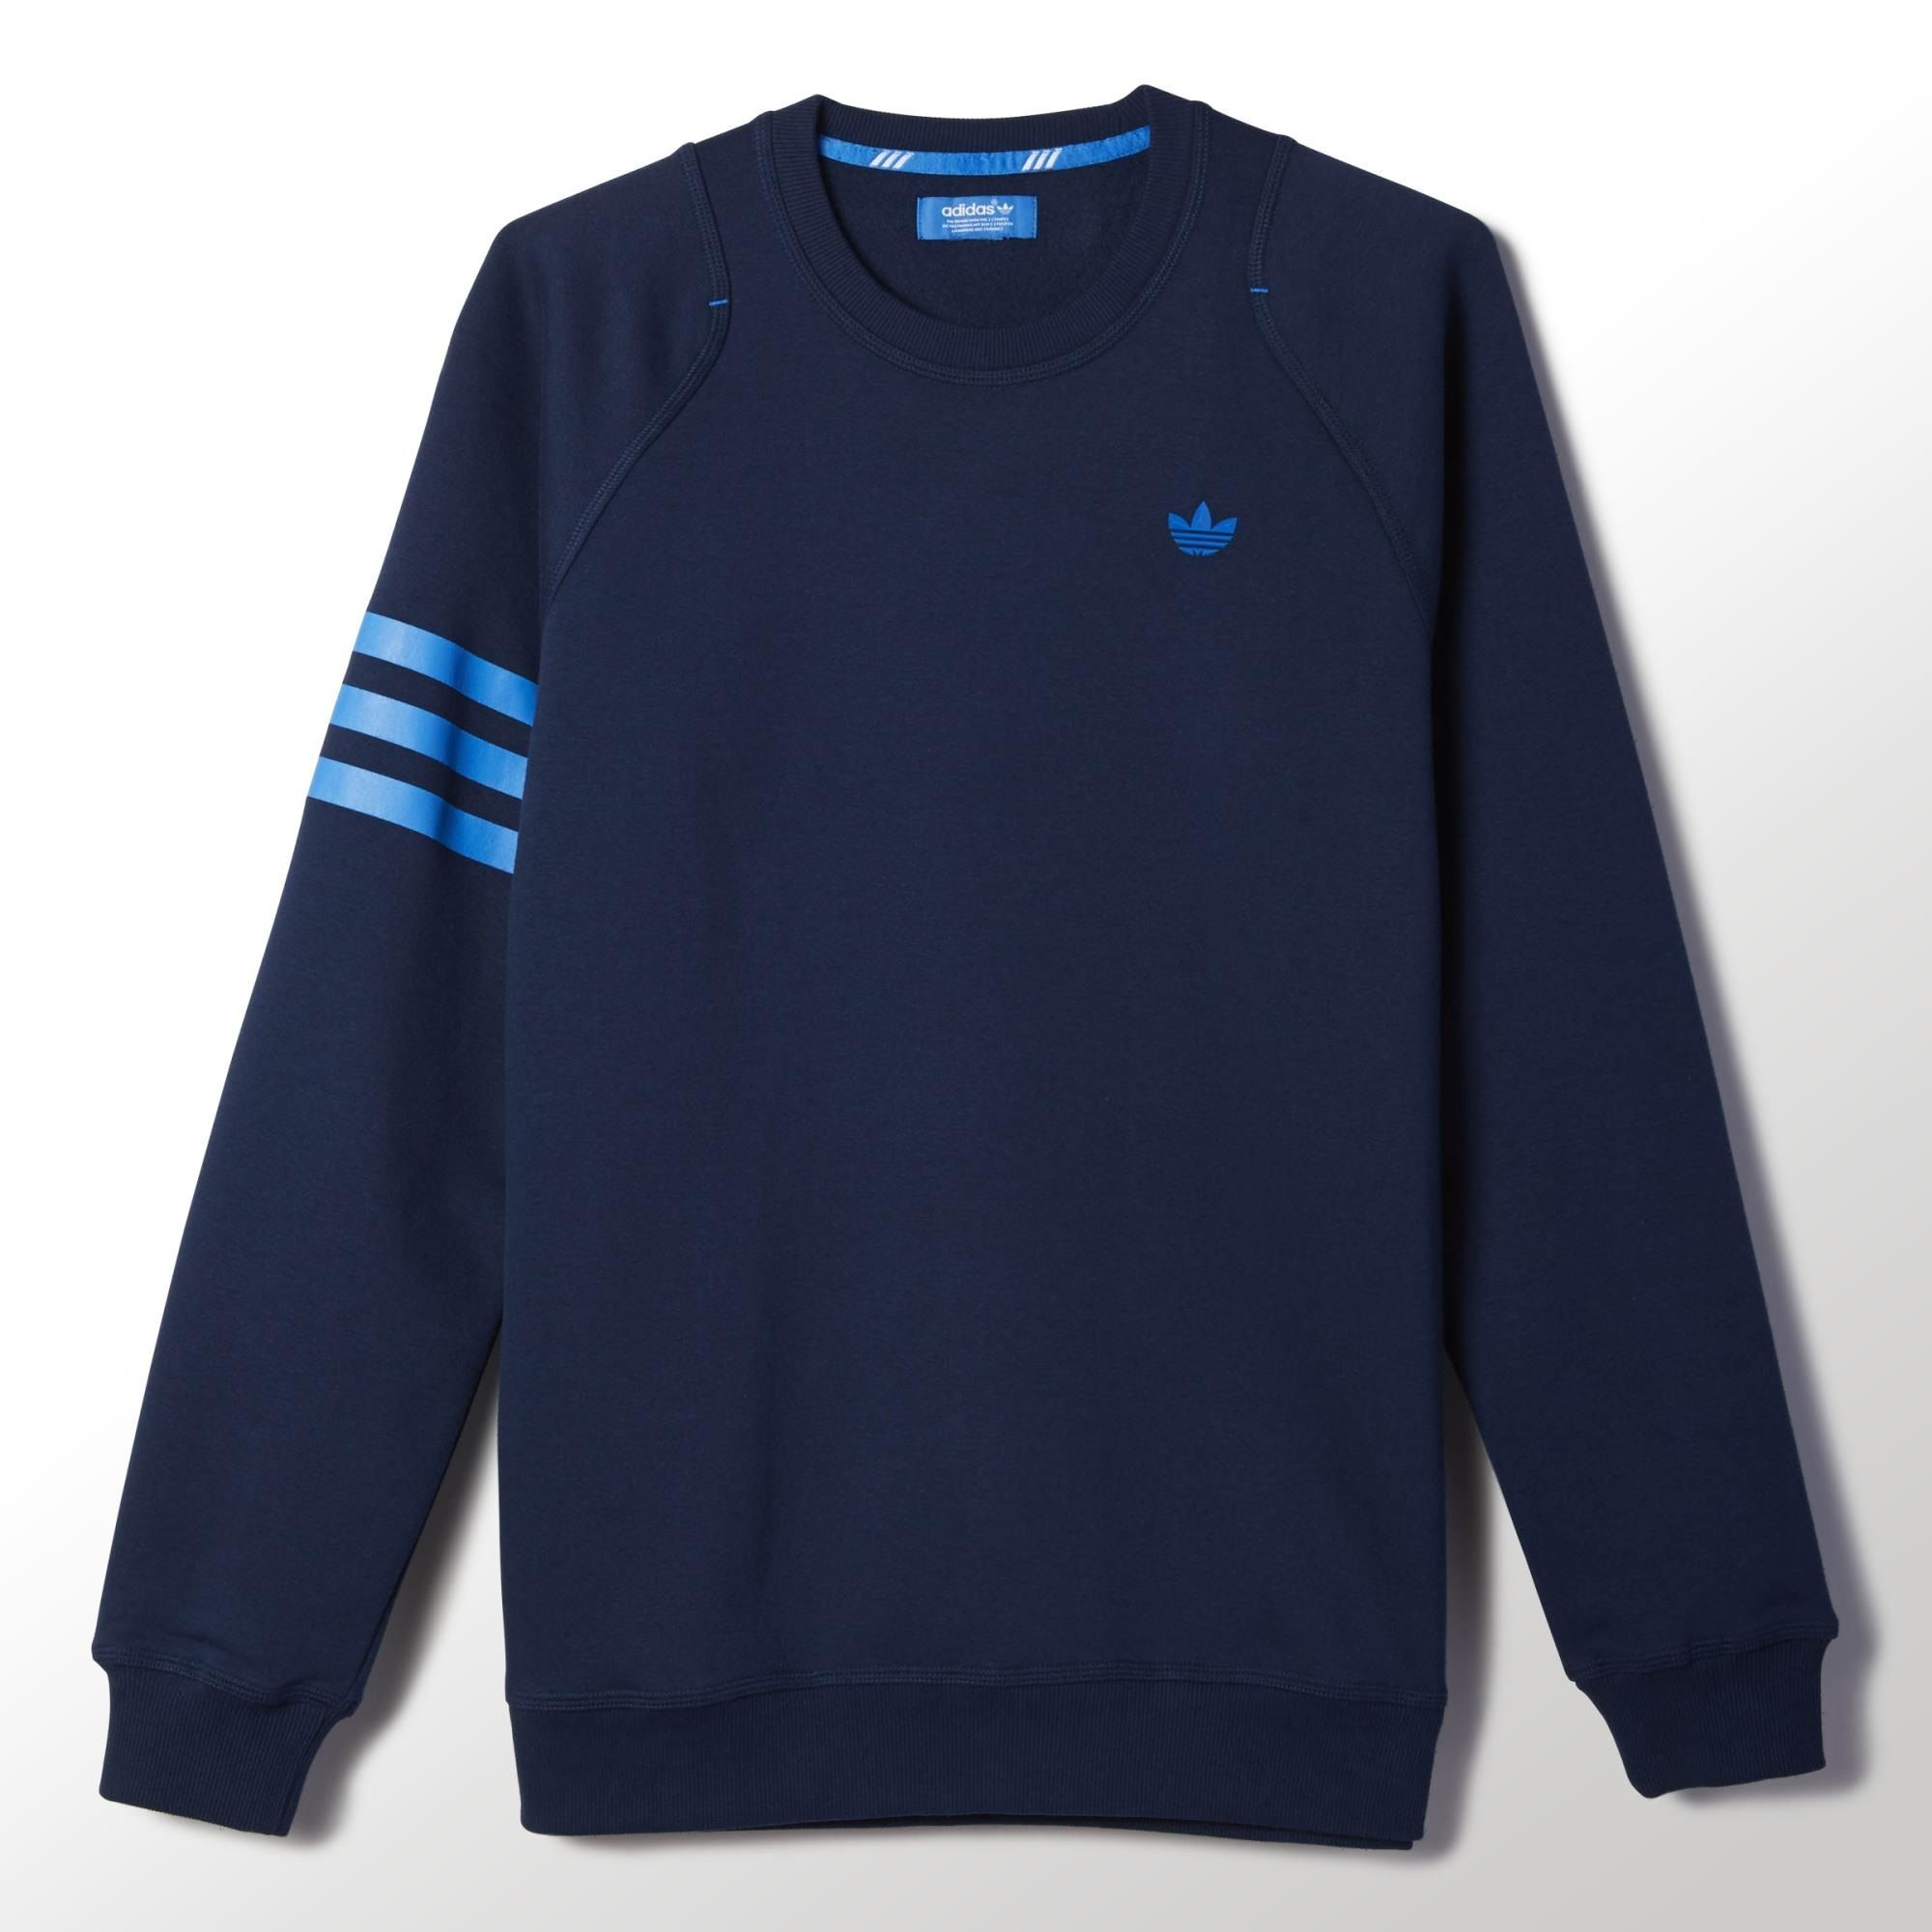 61c518a5cac27 This men s sweatshirt presents a creative take on the 3-Stripes. Cut slim